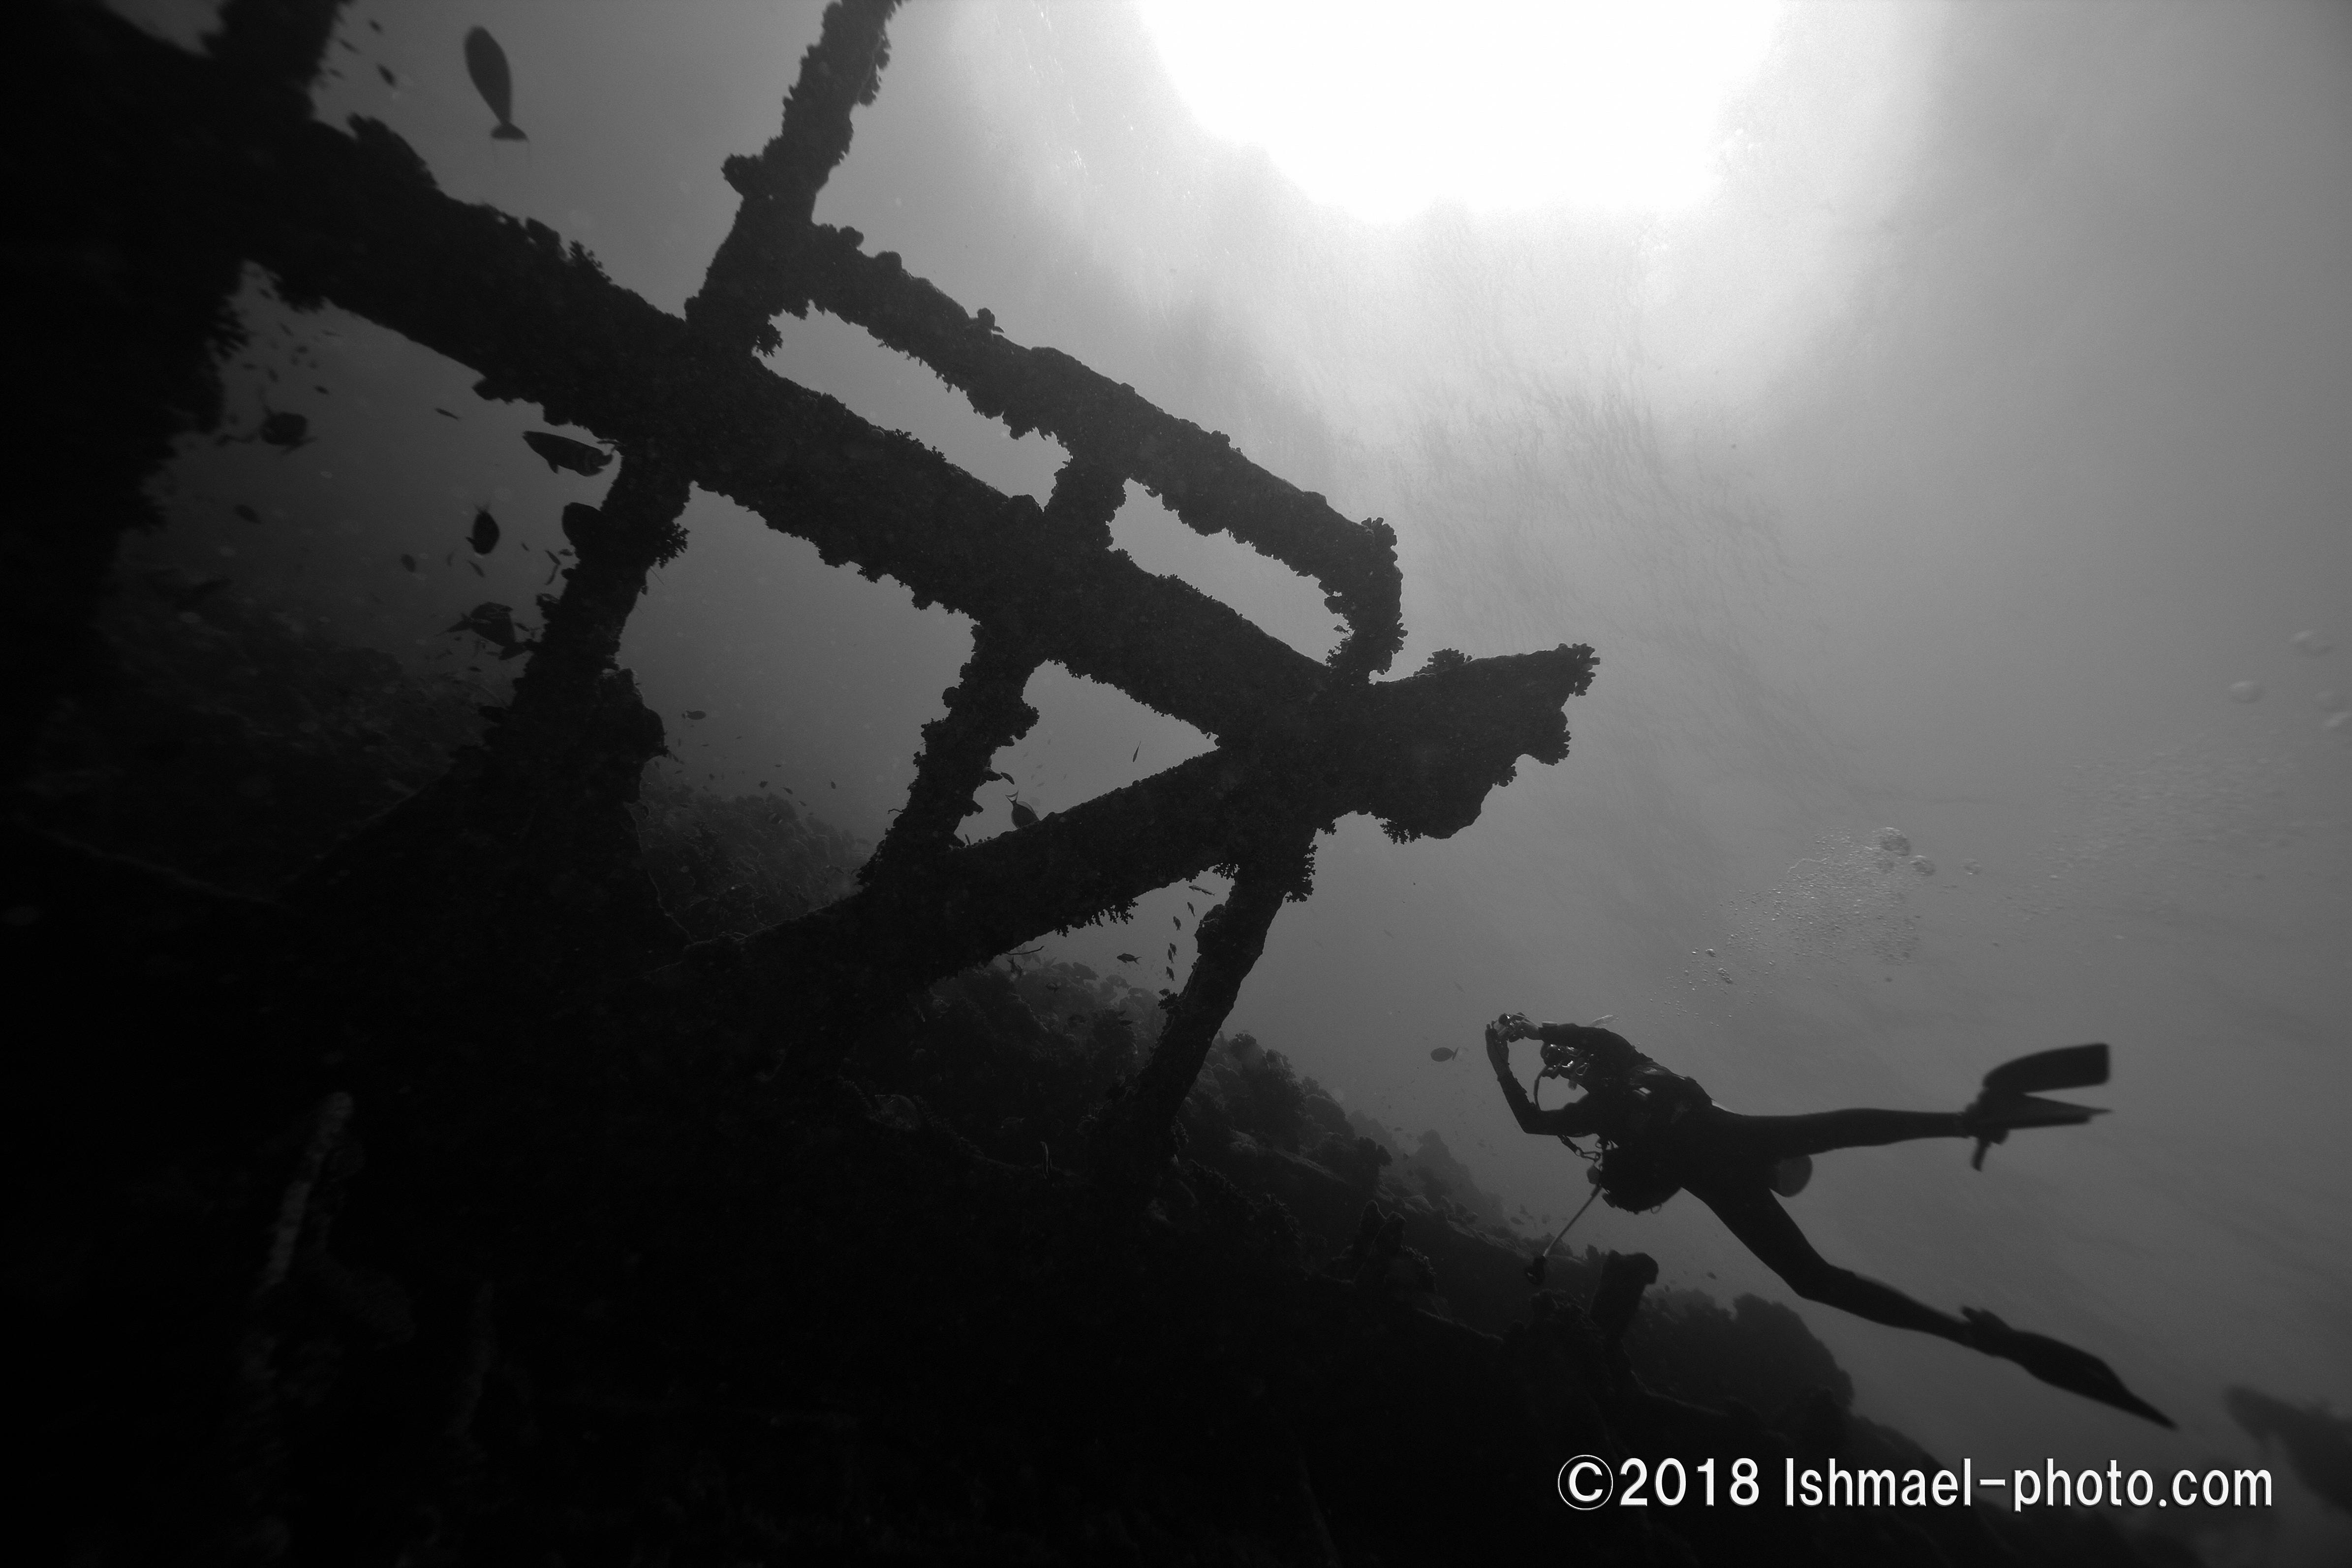 Wreck 沈船